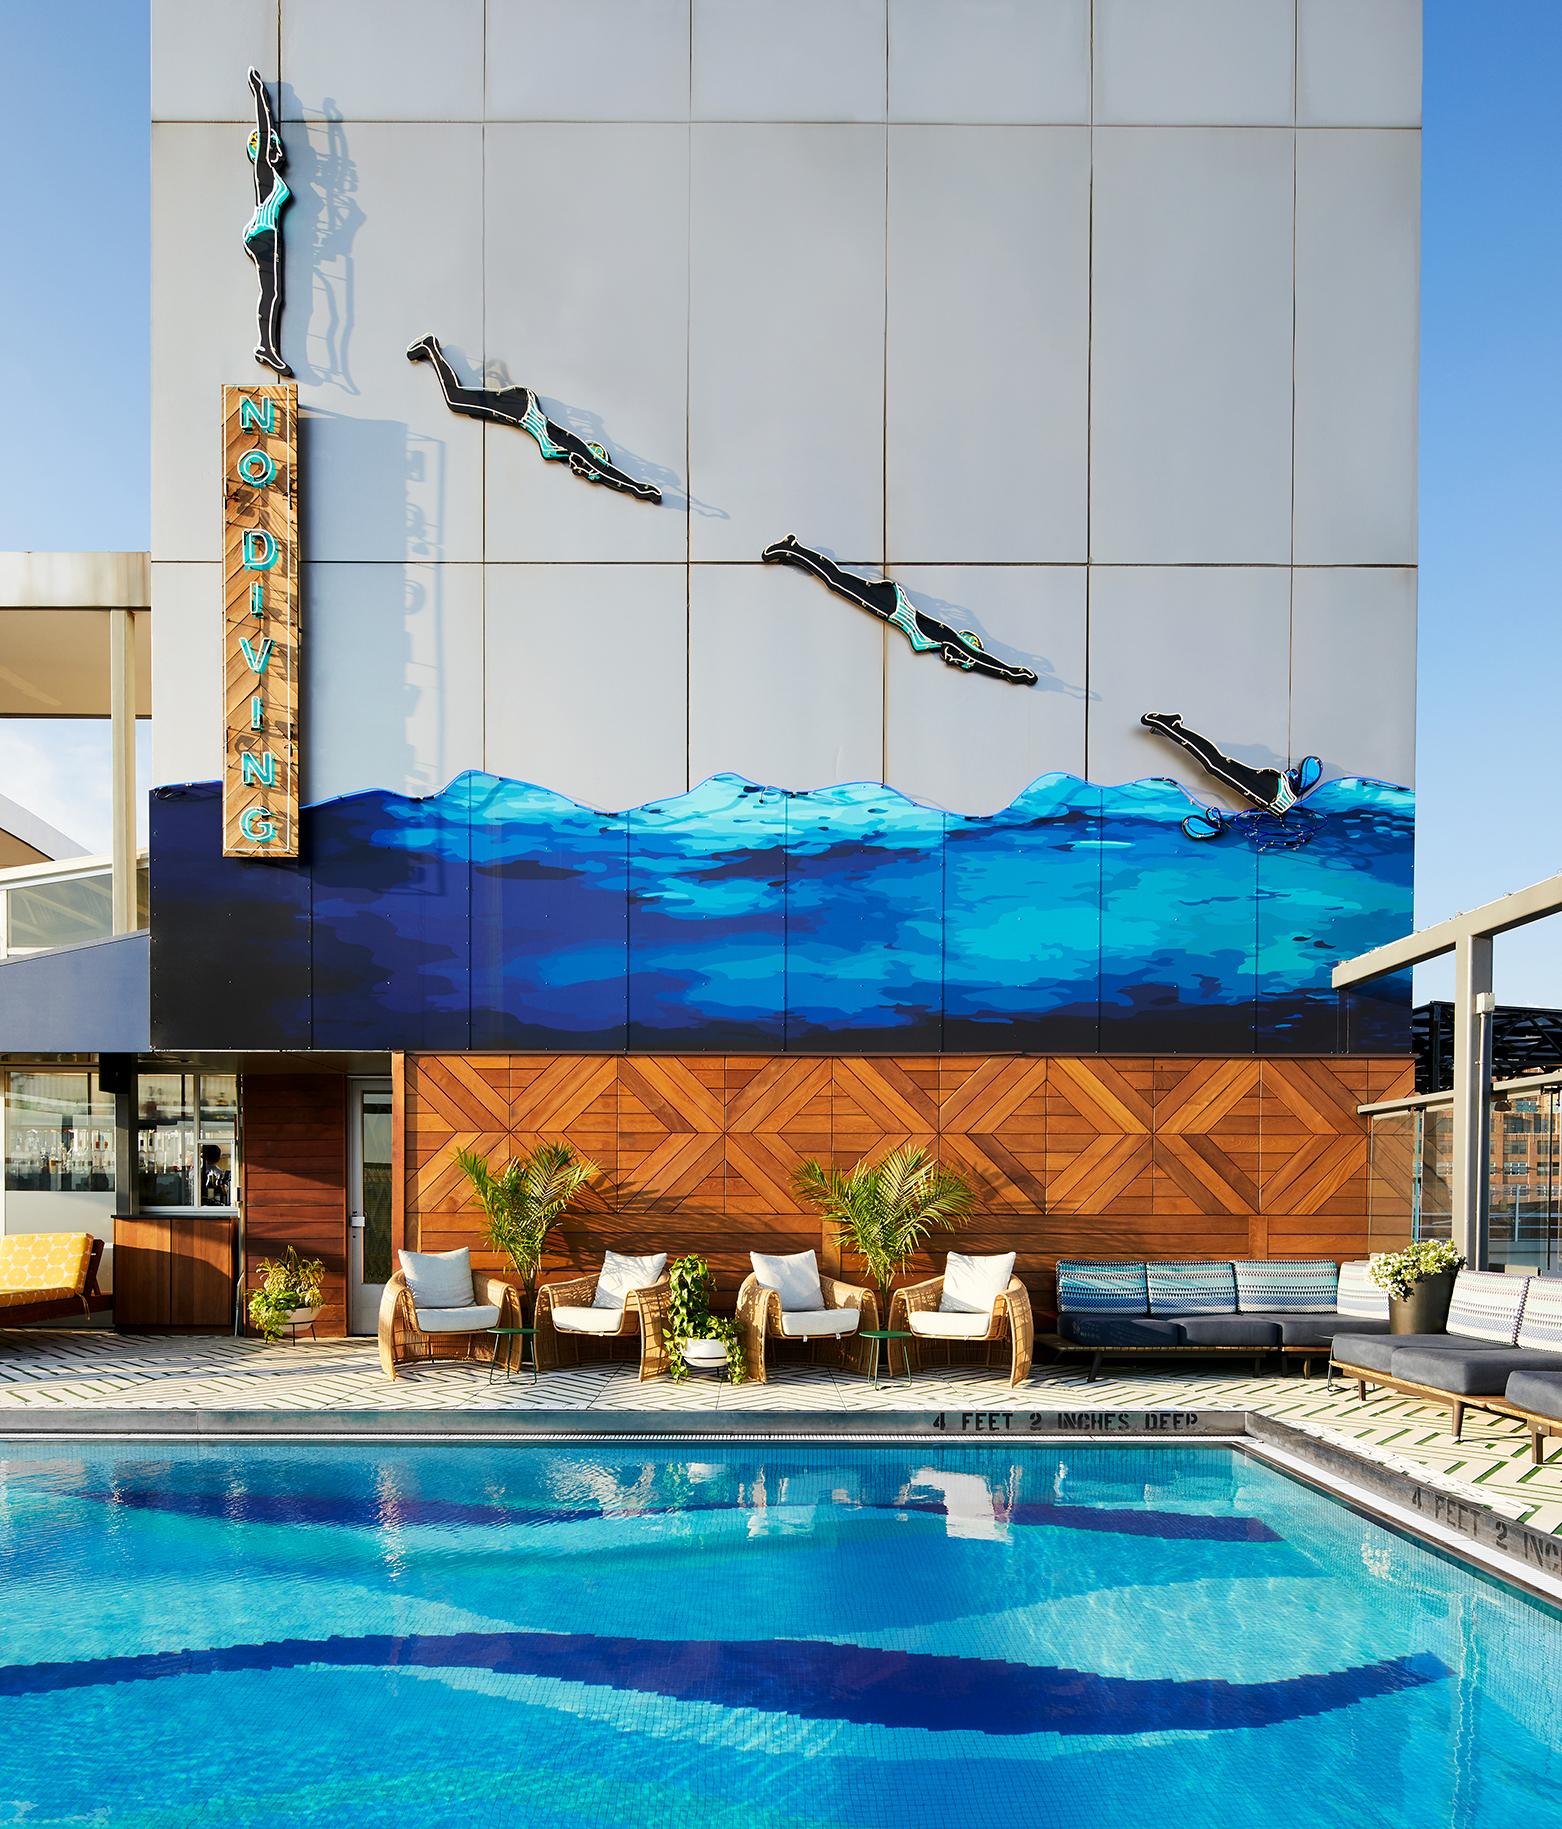 La piscine chauffée du Gansevoort Meatpacking Hotel.